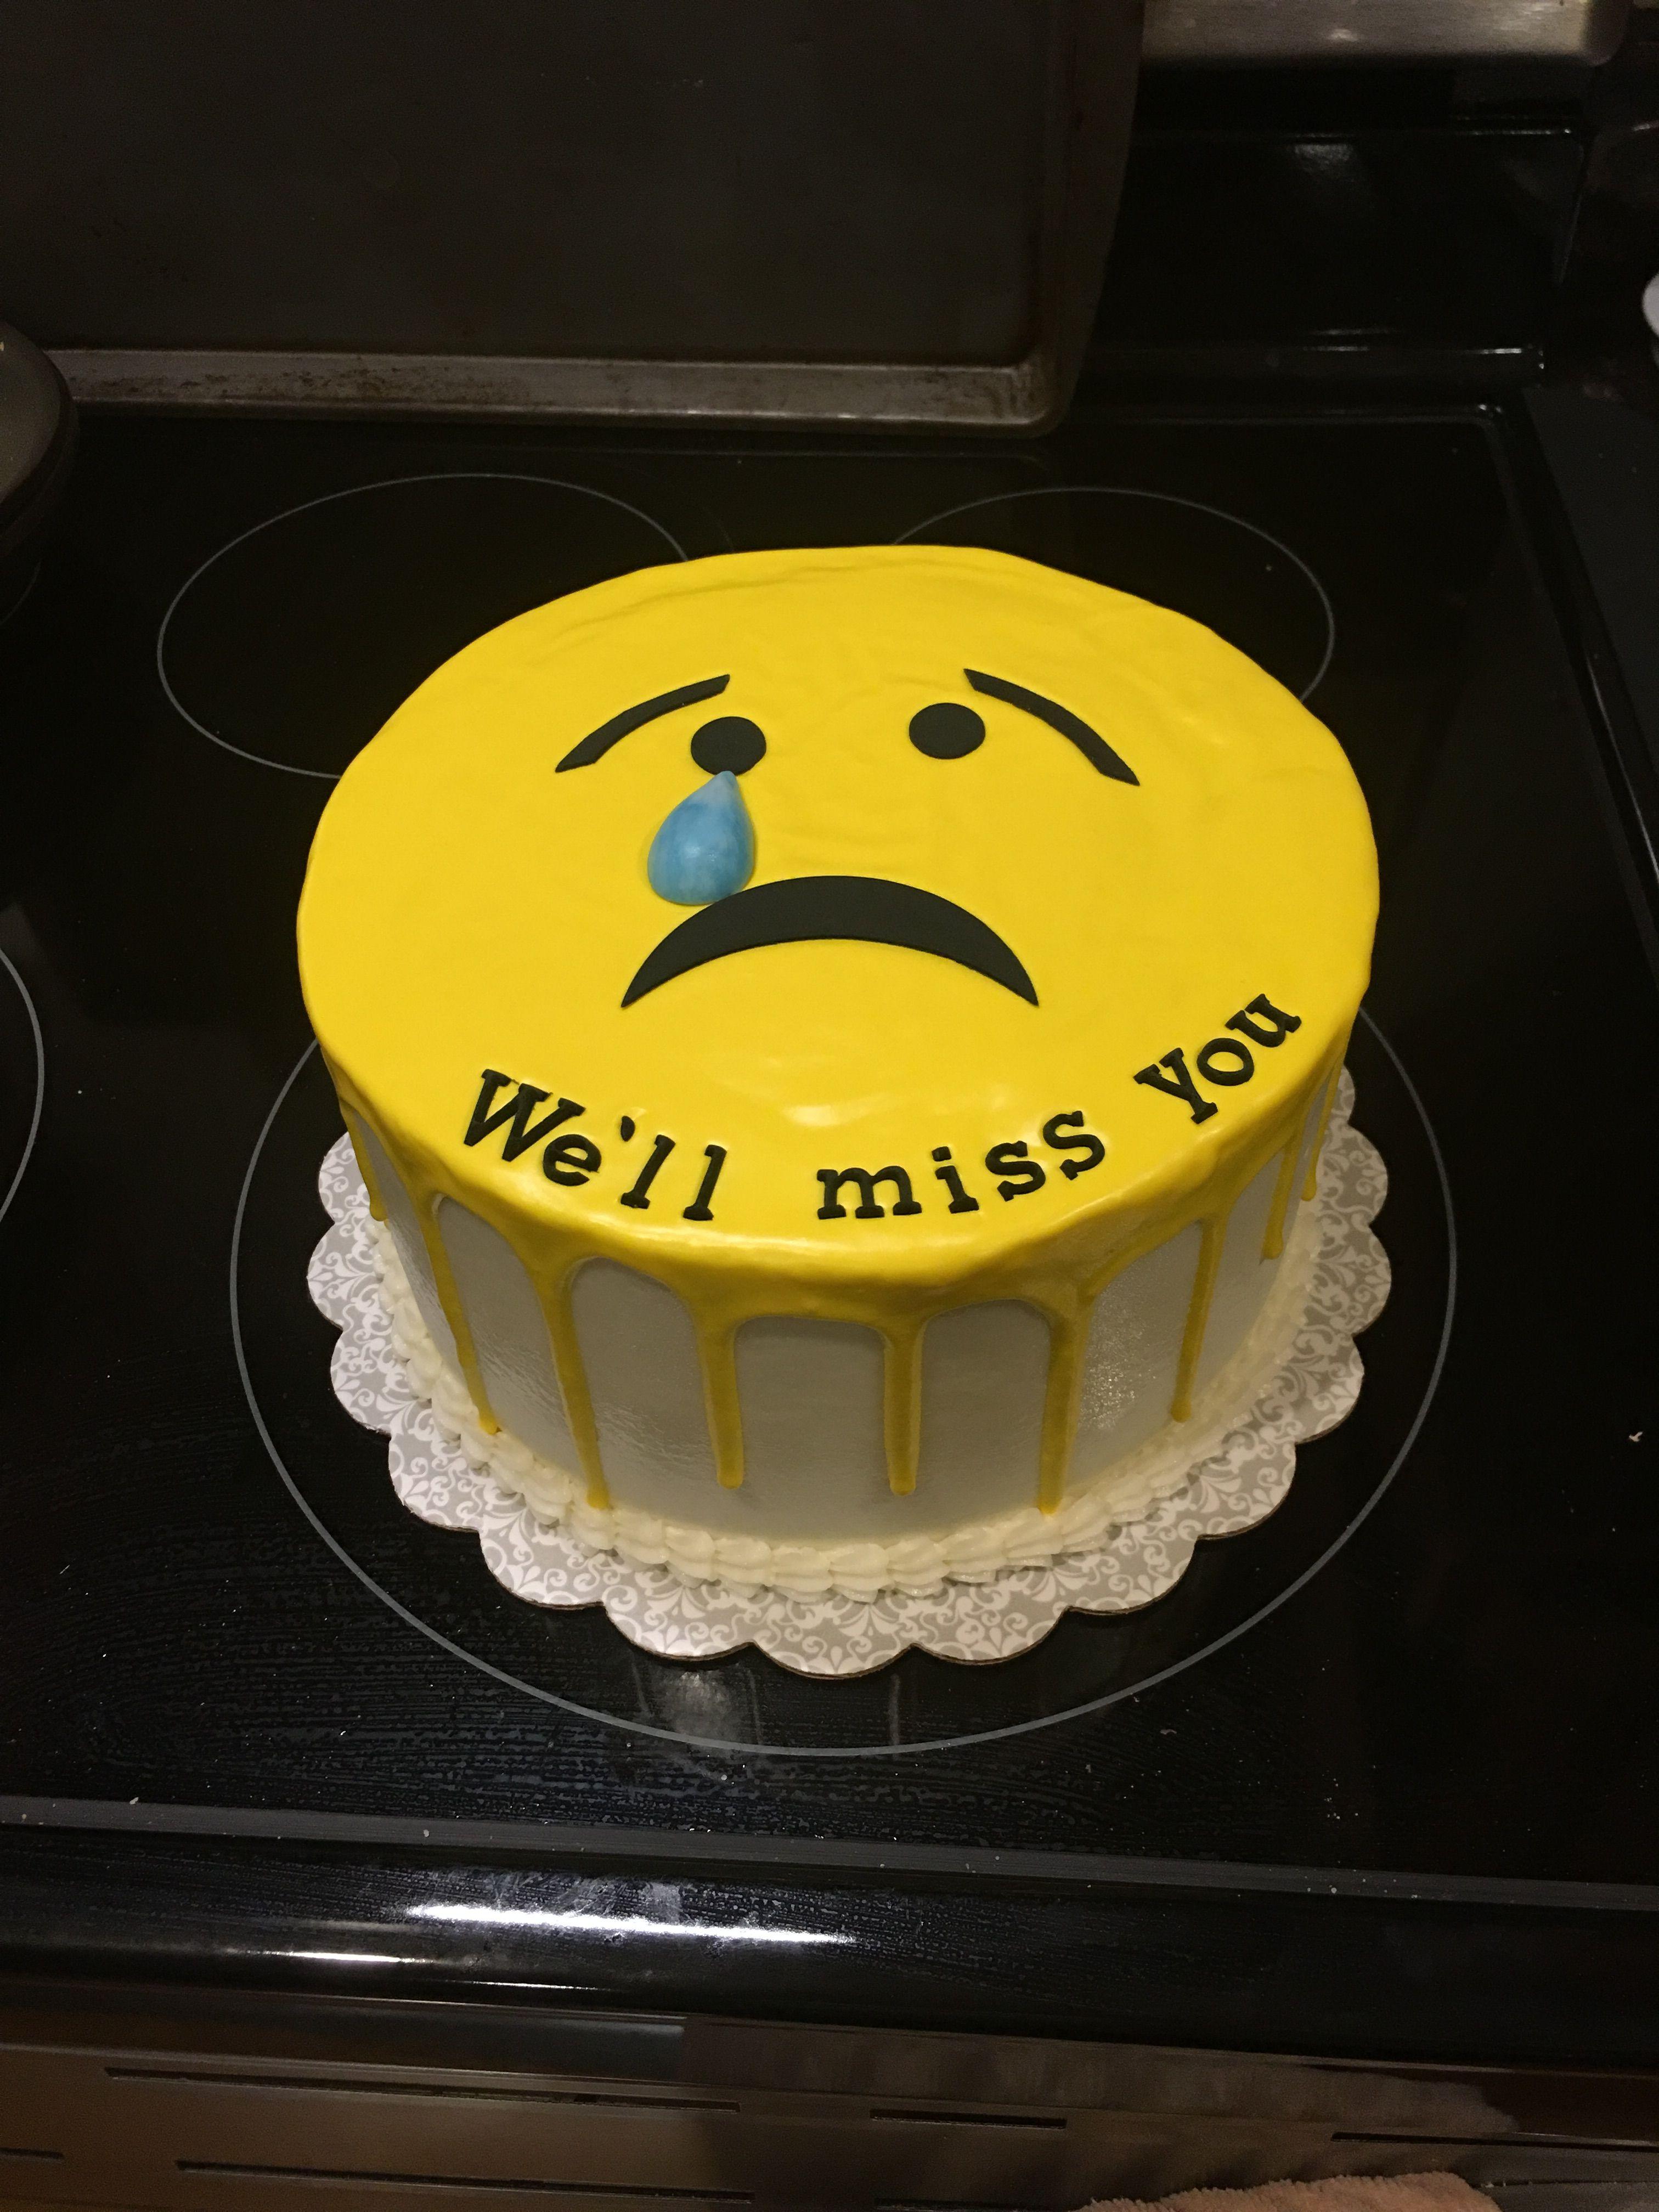 Emoji Cake For A Farewell Party Farewell Cake Retirement Cakes Emoji Cake